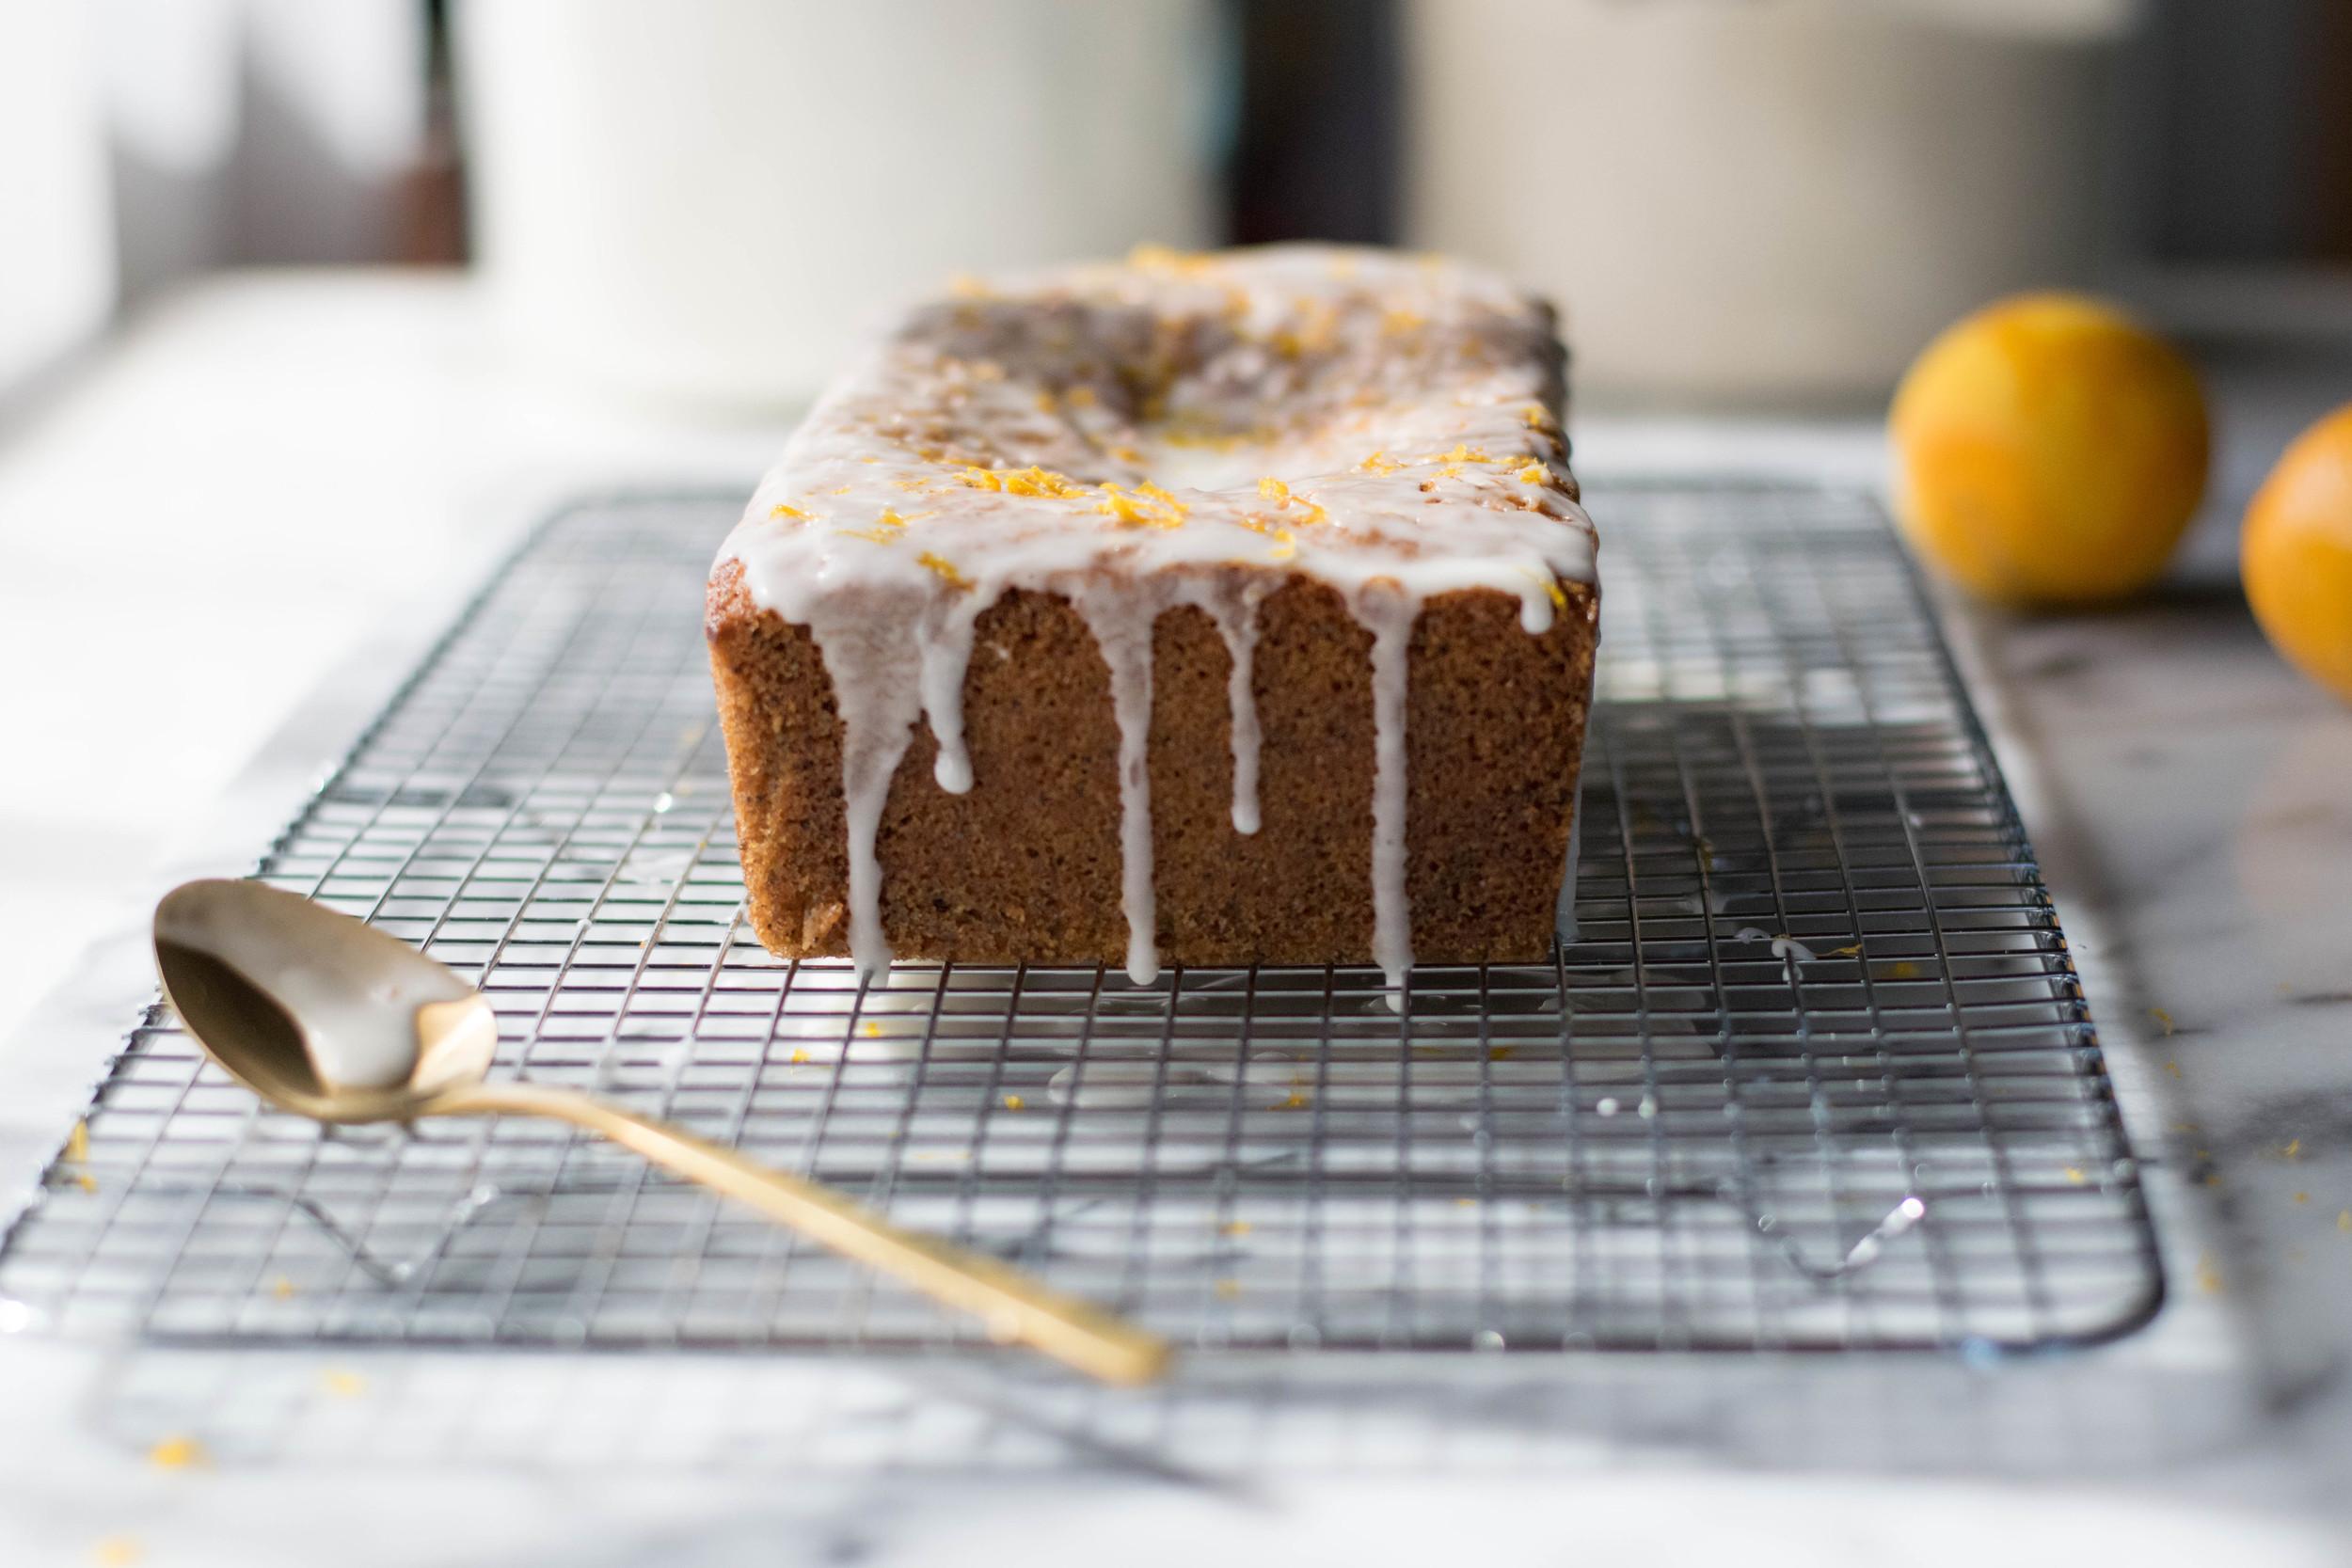 Meyer Lemon + Almond Poppy Seed Pound Cake | All Purpose Flour Child